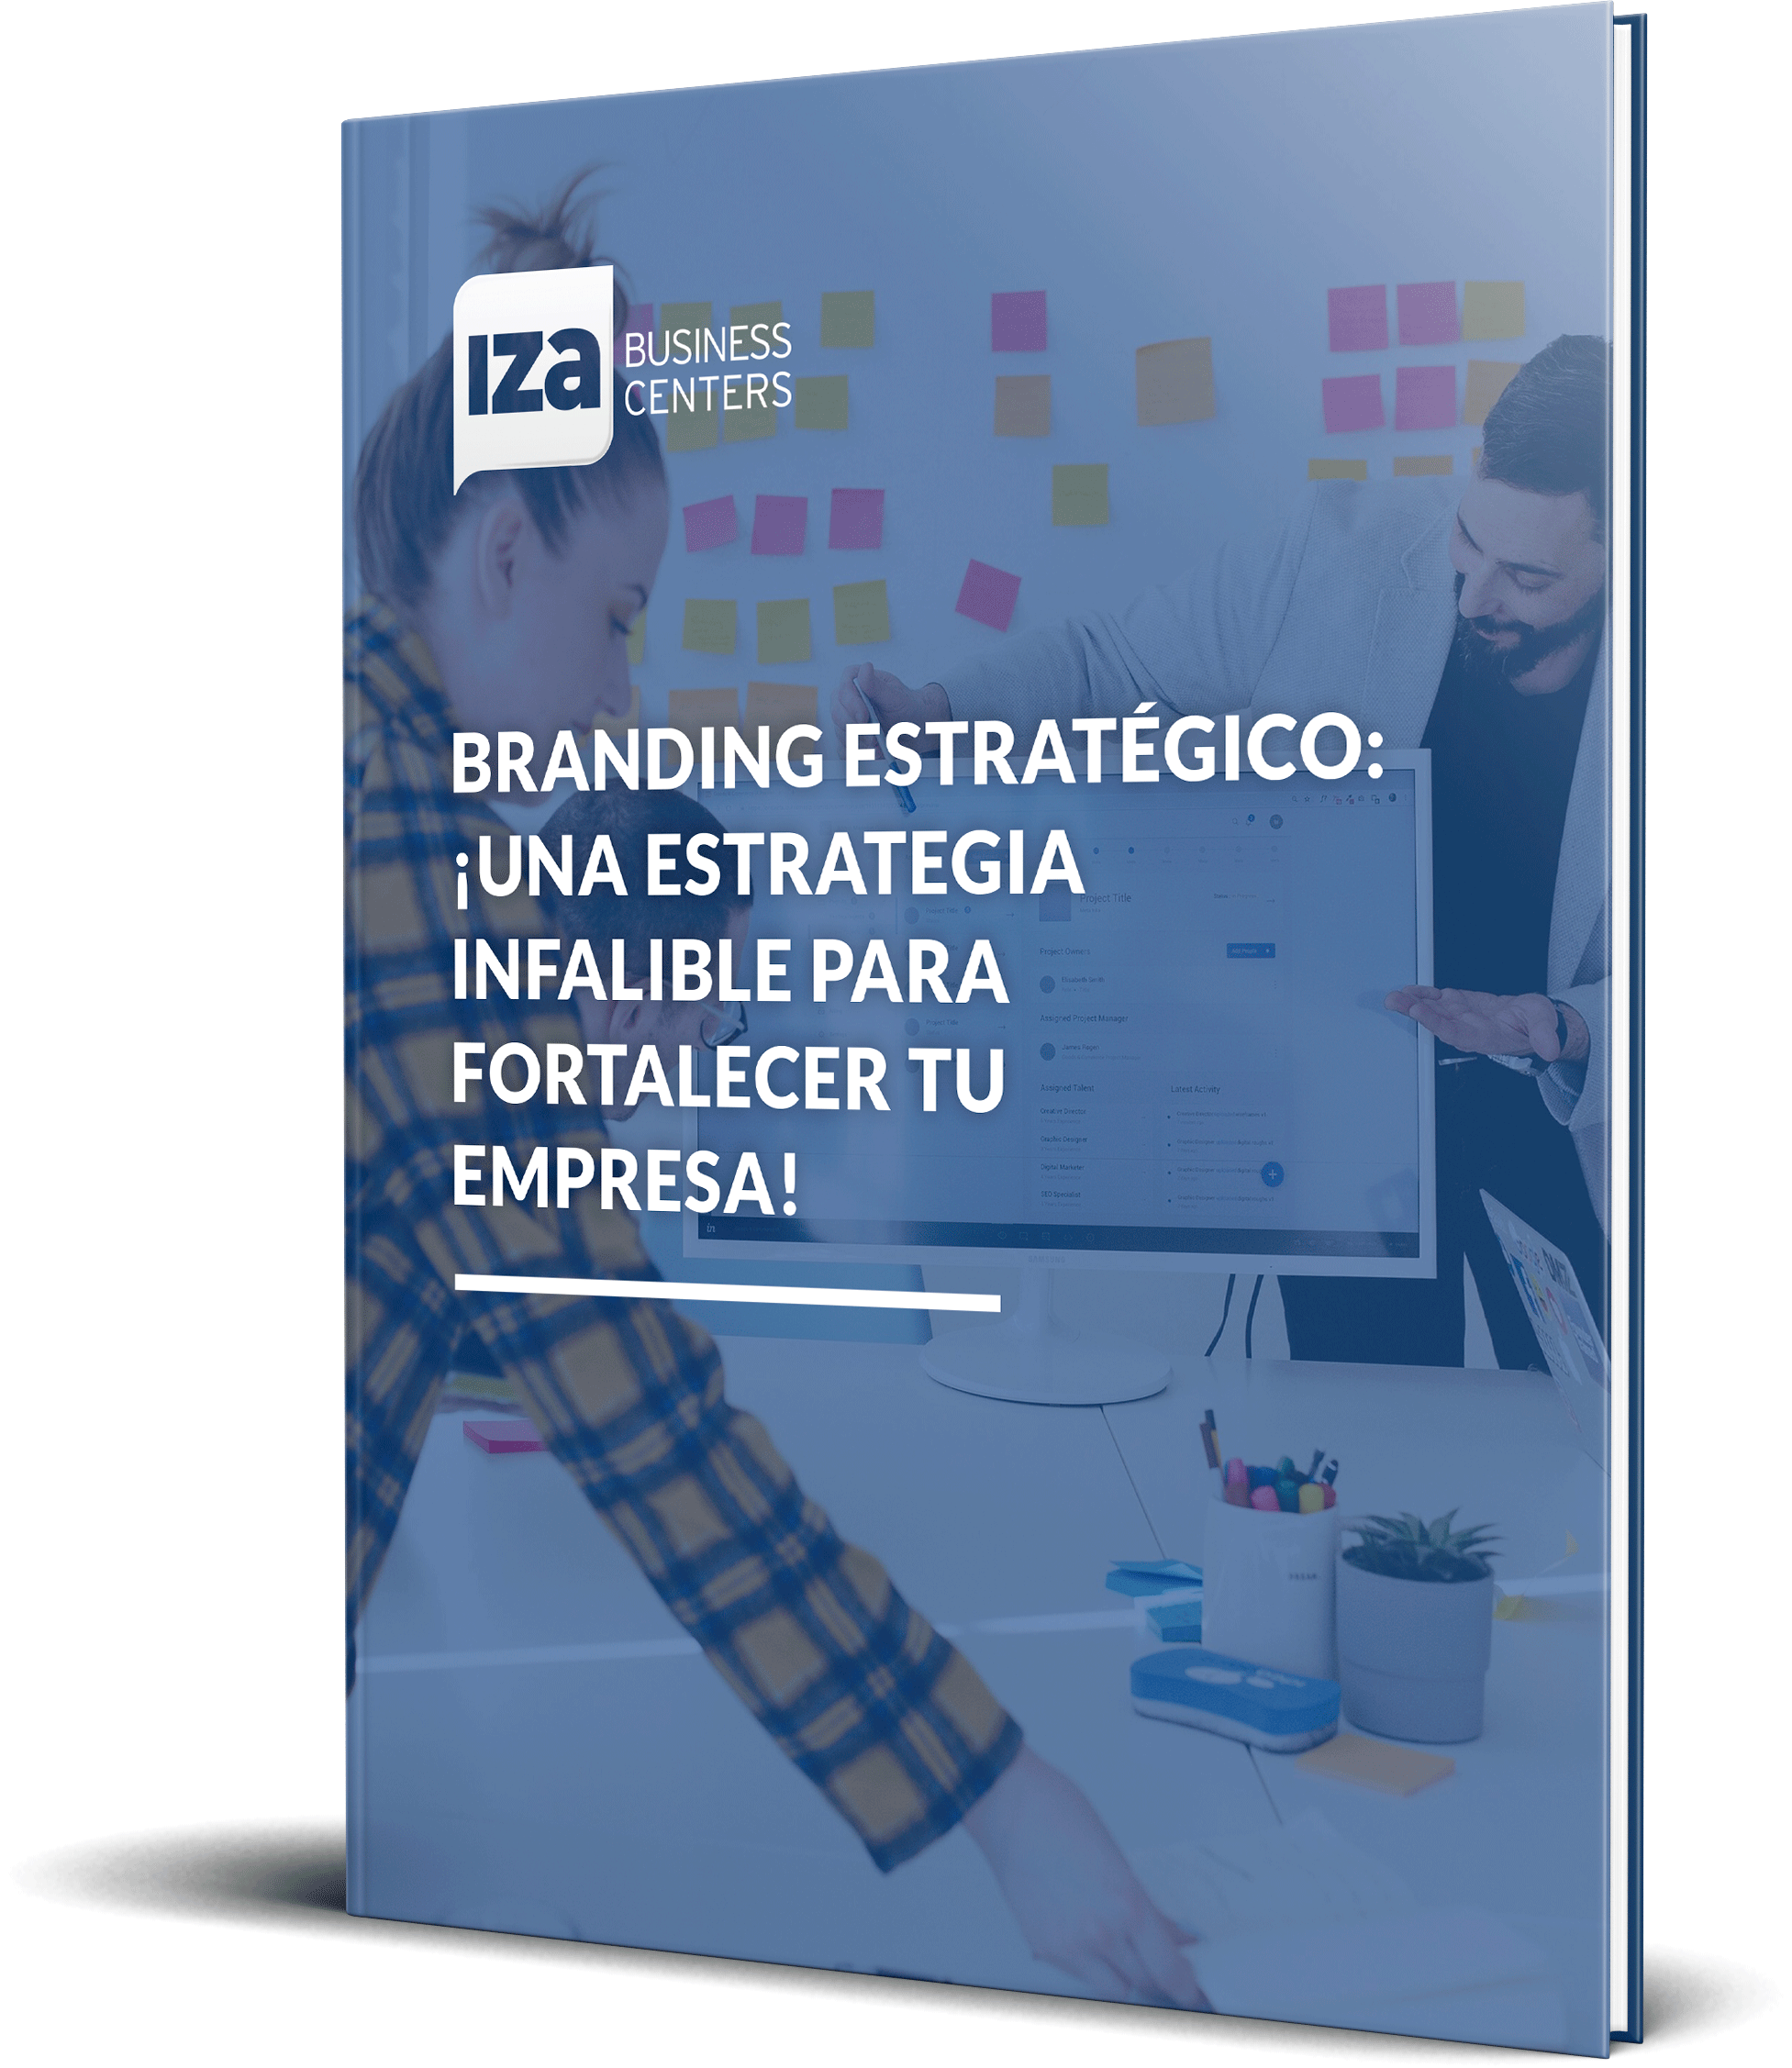 Mockup-branding-estrategico-una-estragia-inflalible-para-fotralecer-tu-empresa-IZA